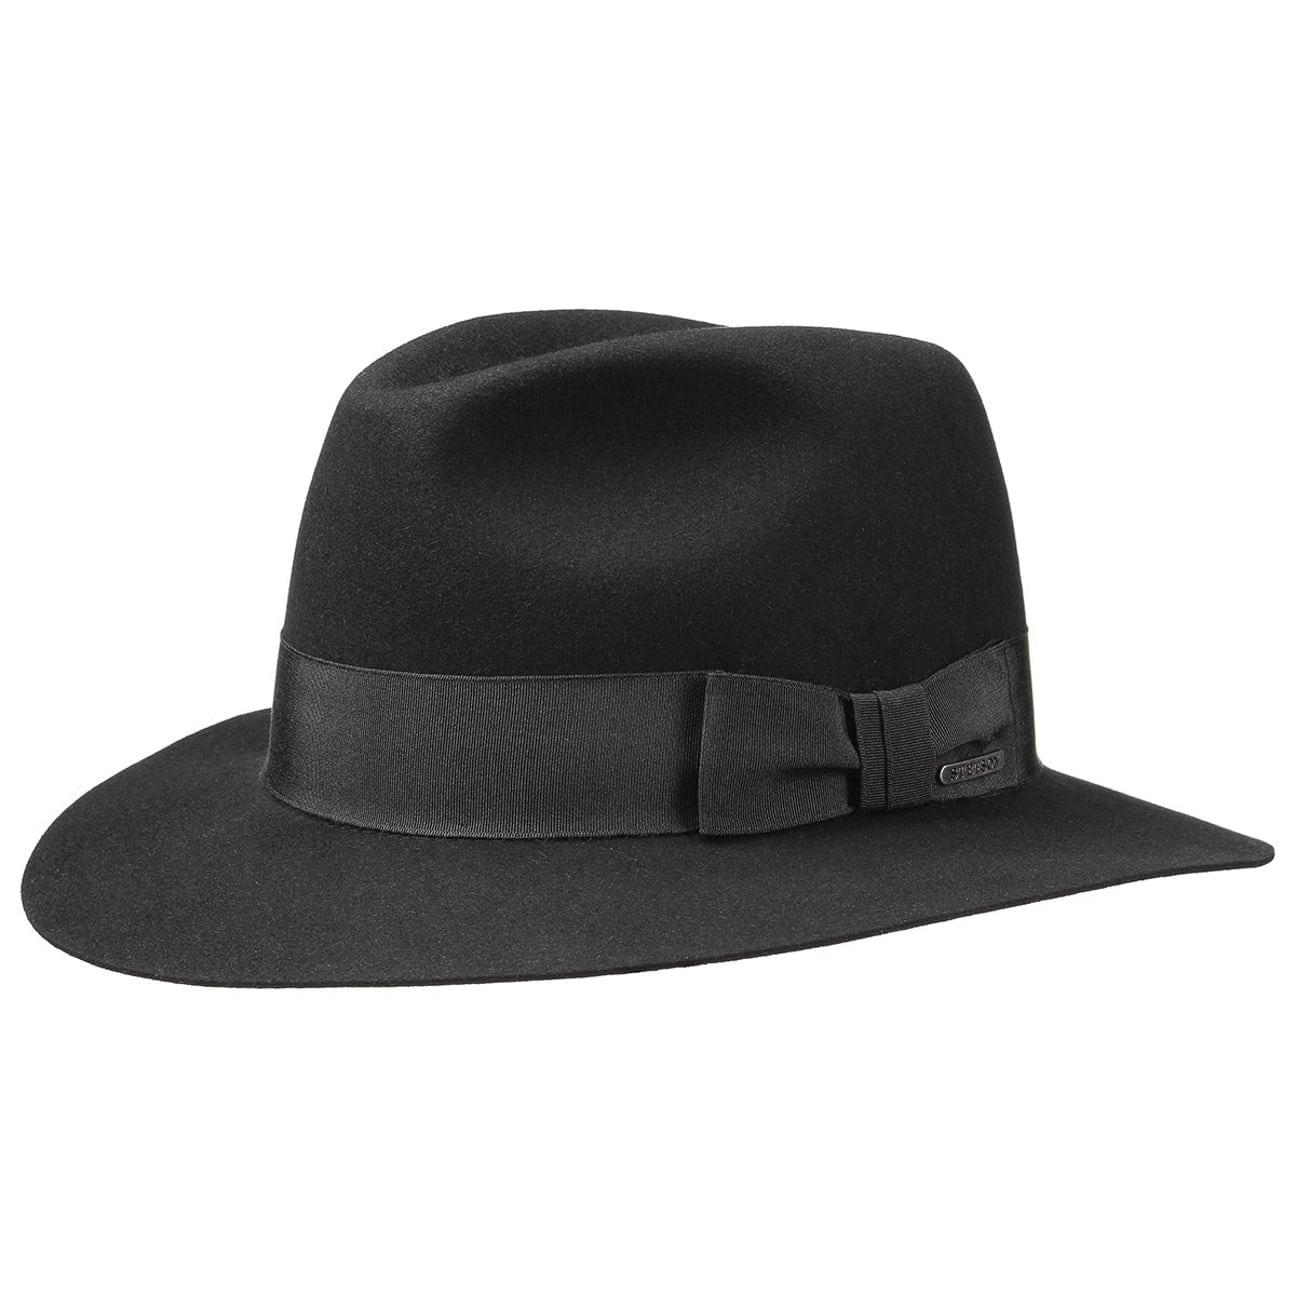 9ab7de199a96a Sombrero Fieltro de Pelo Dalion by Stetson - Sombreros - sombreroshop.es